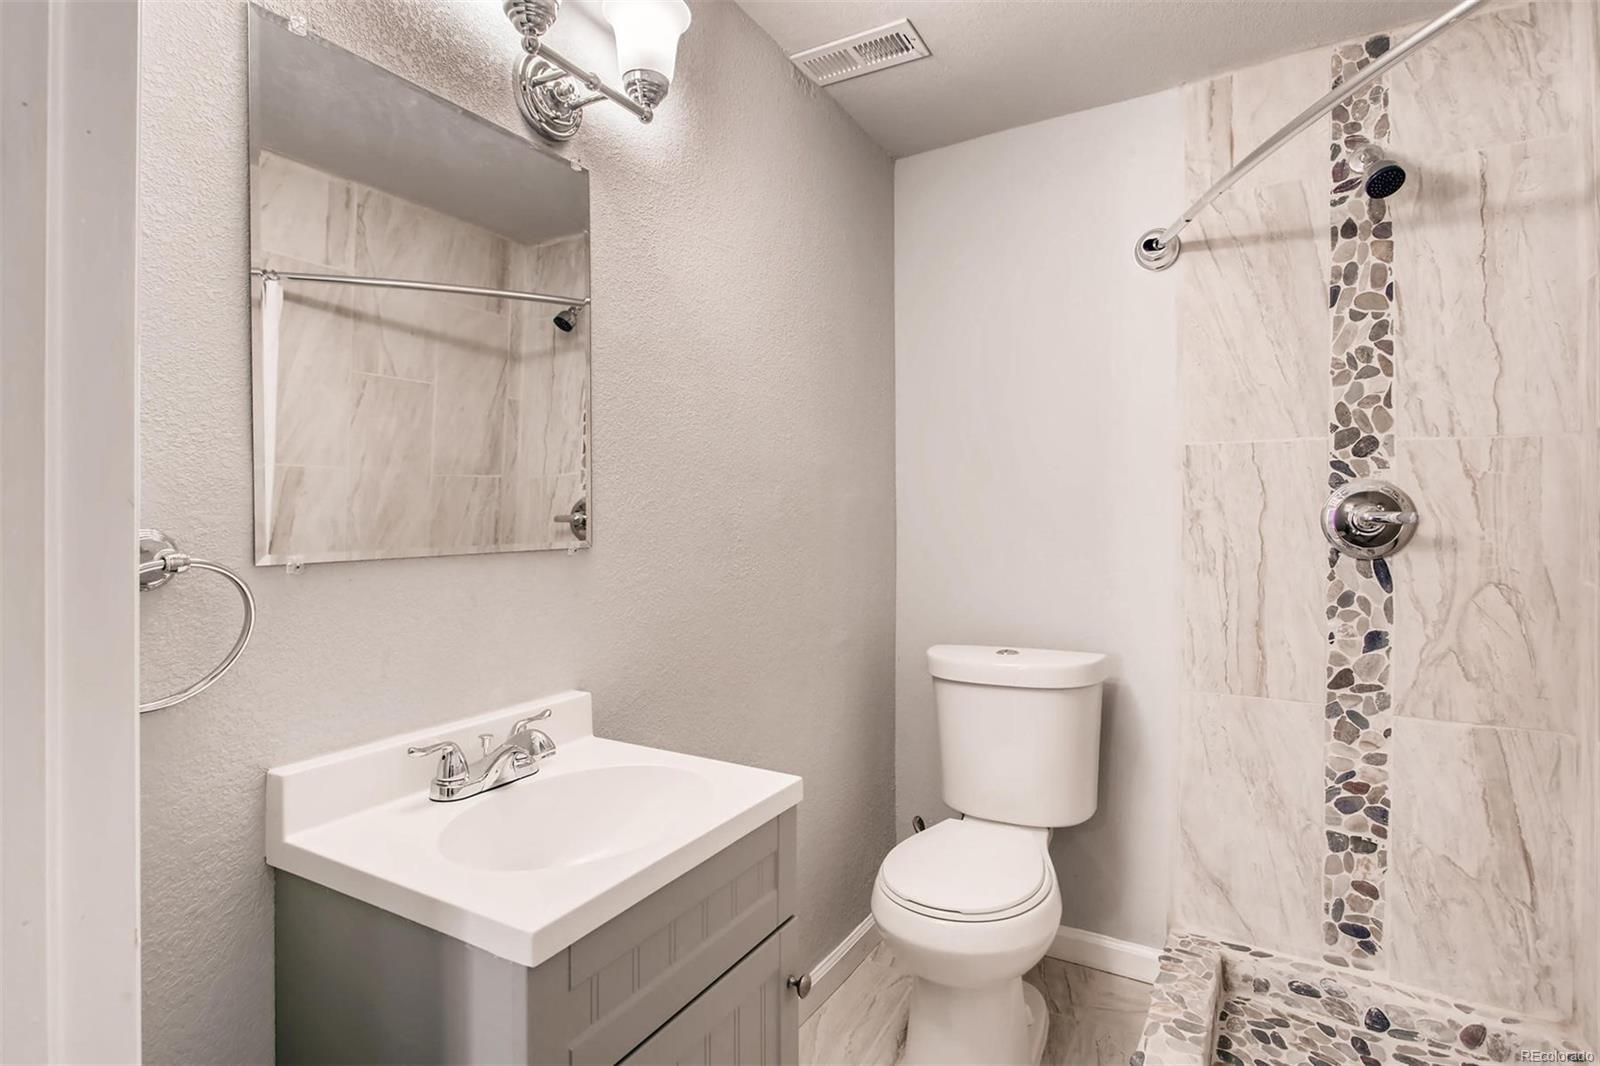 3/4 Bath (Basement Level)